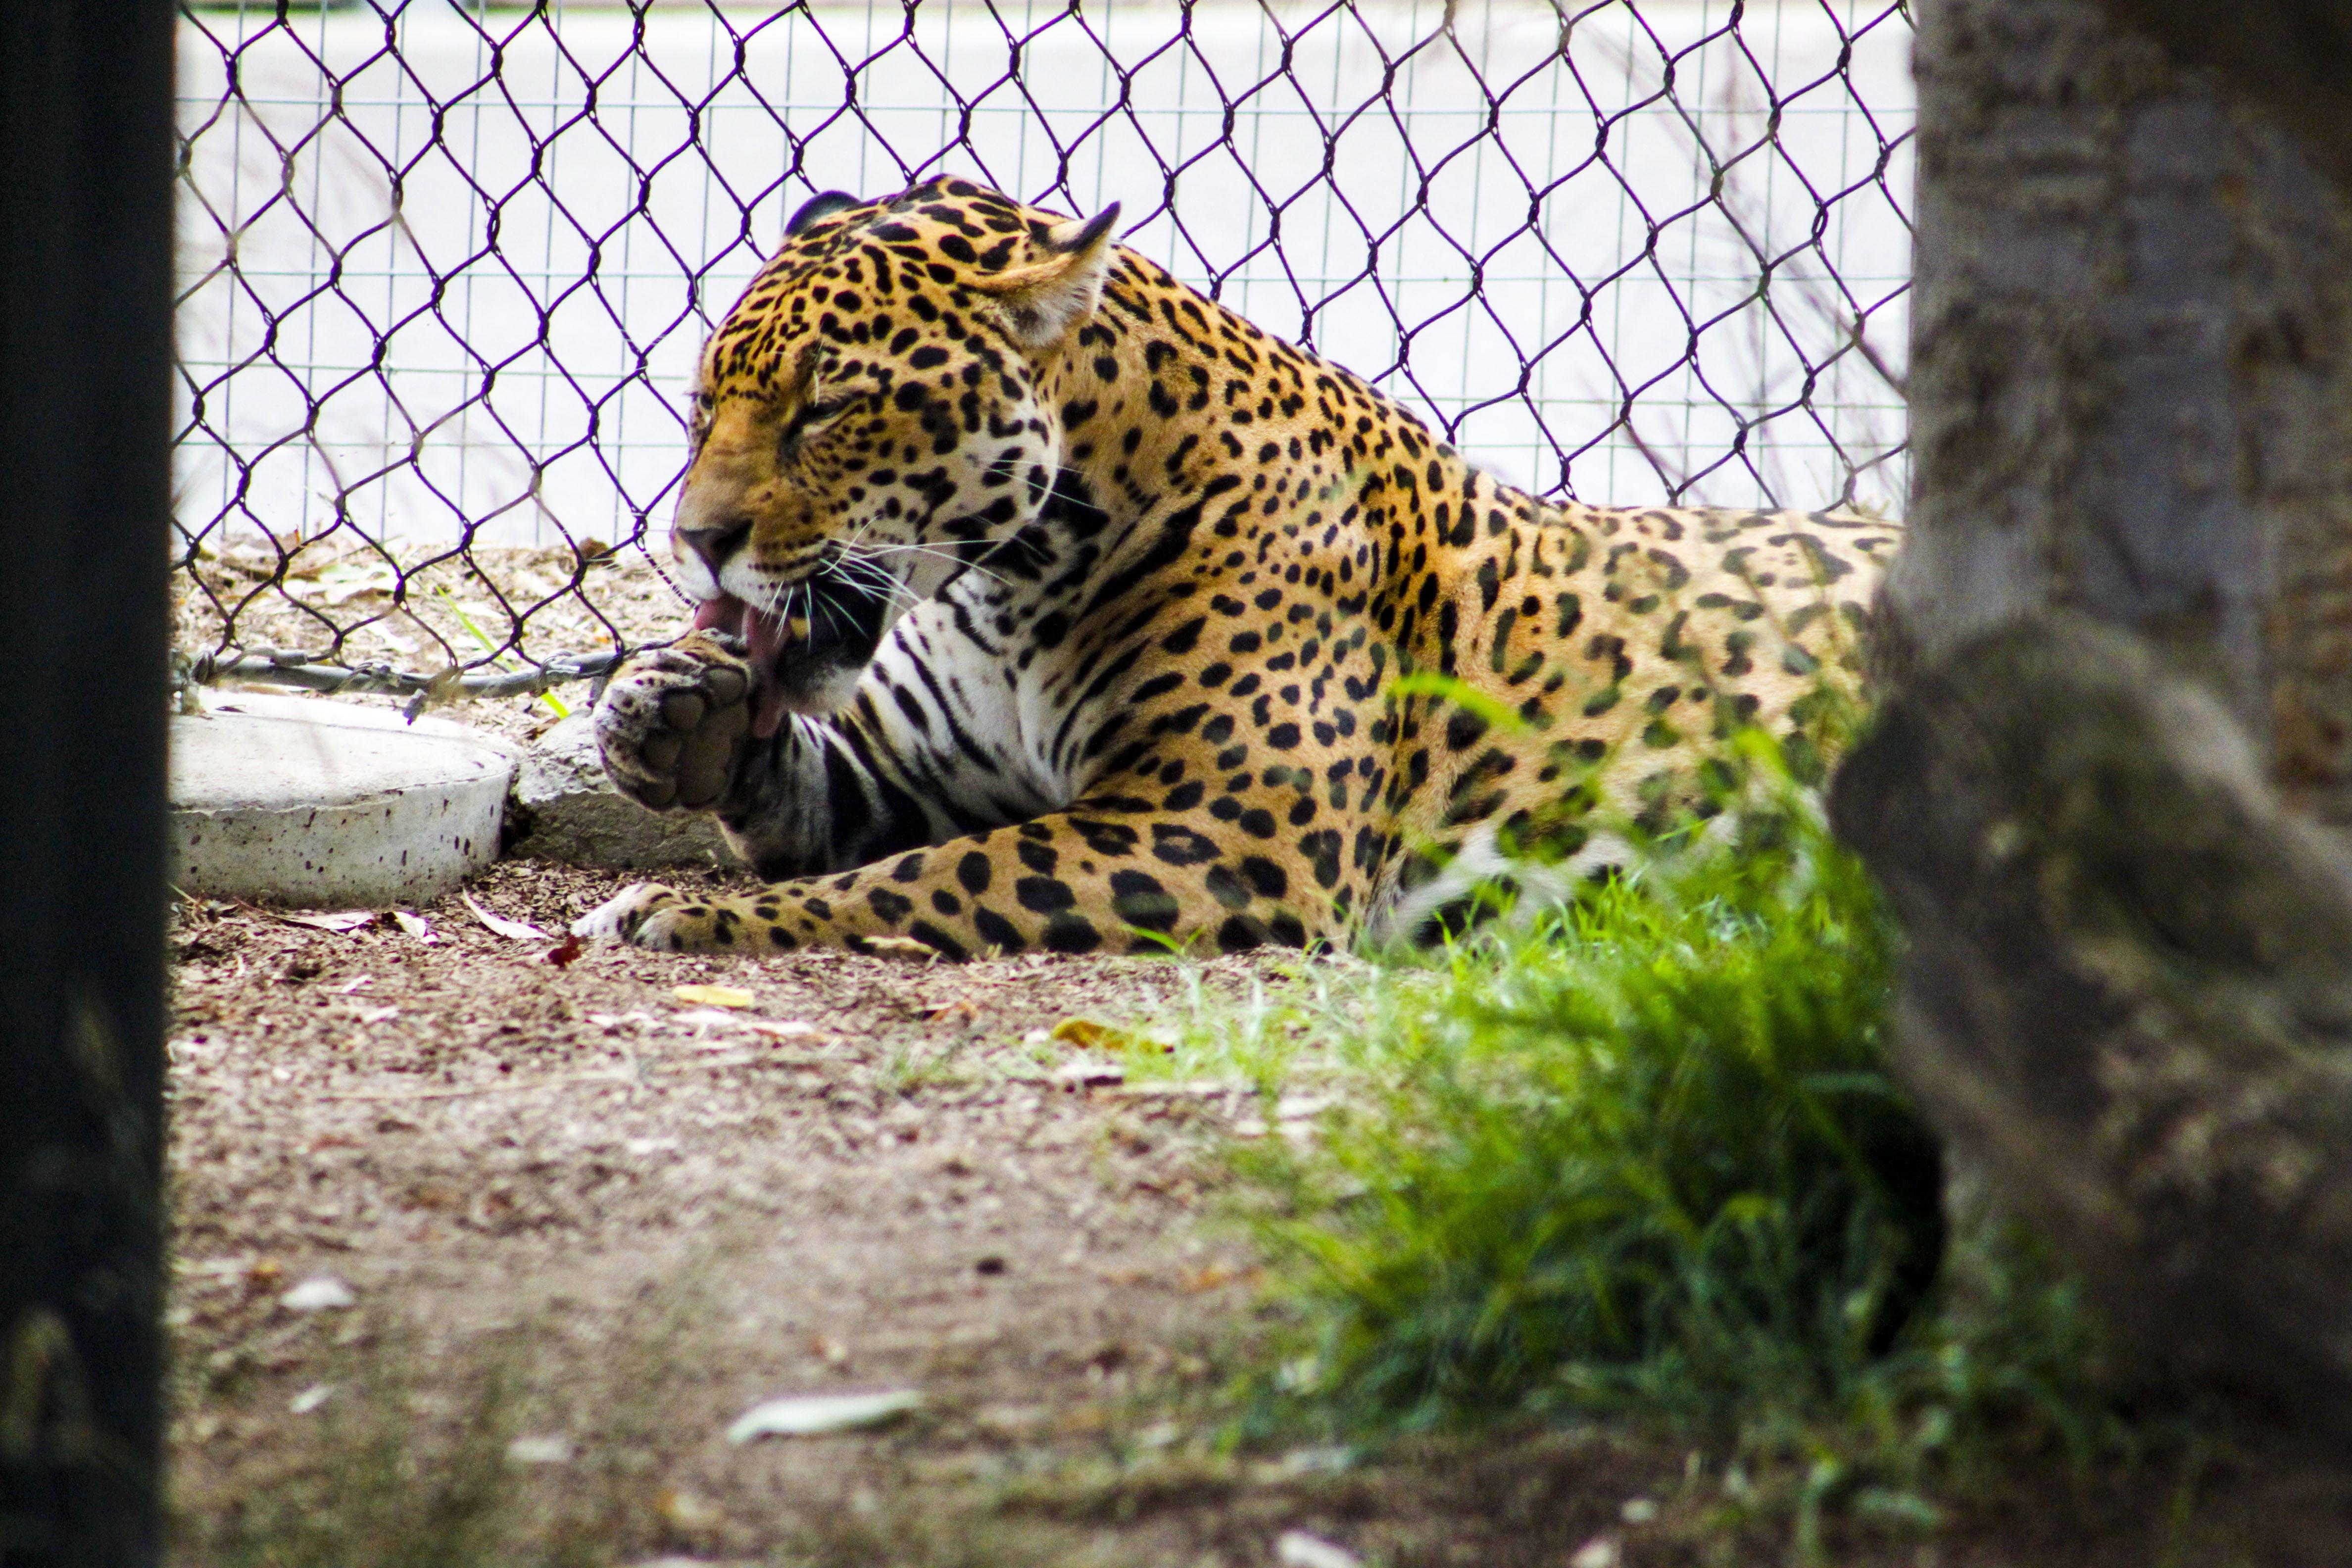 Leopard Lying Beside Gray Metal Chain Link Fence